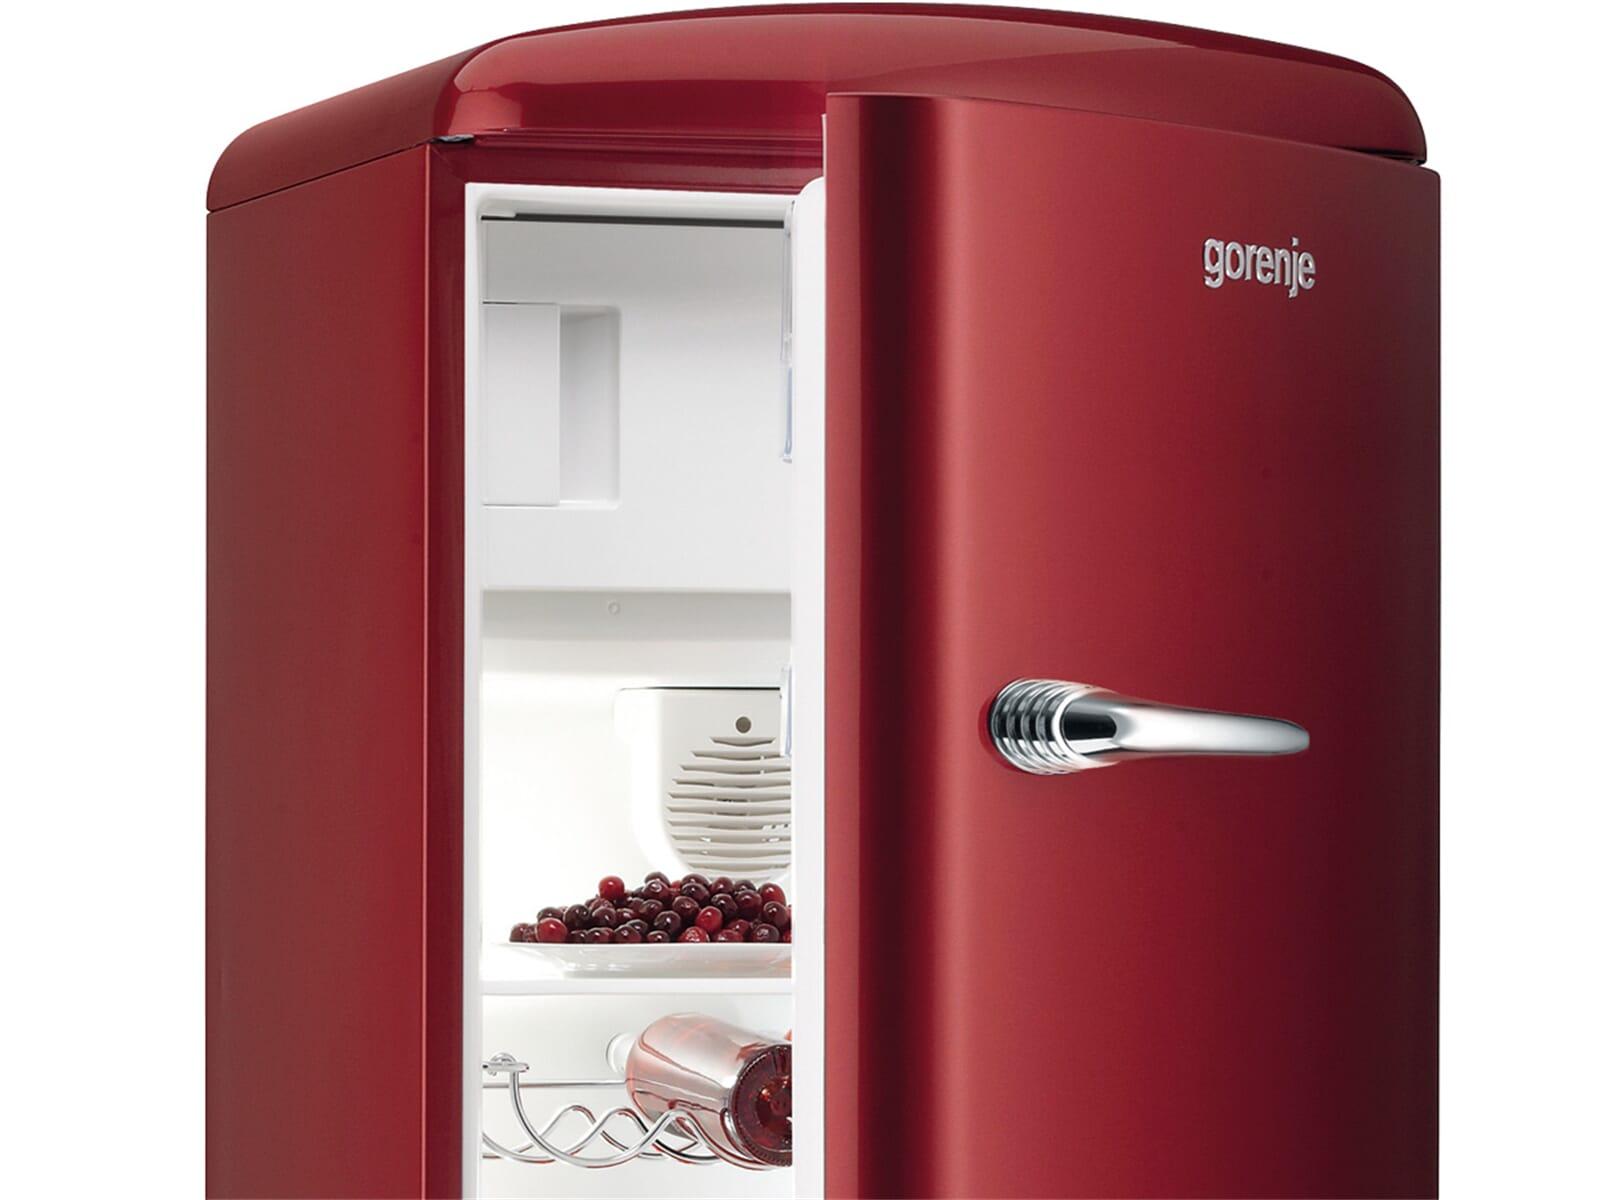 Kühlschrank In Rot : Kühlschrank retro gorenje cool retro kühlschrank günstig